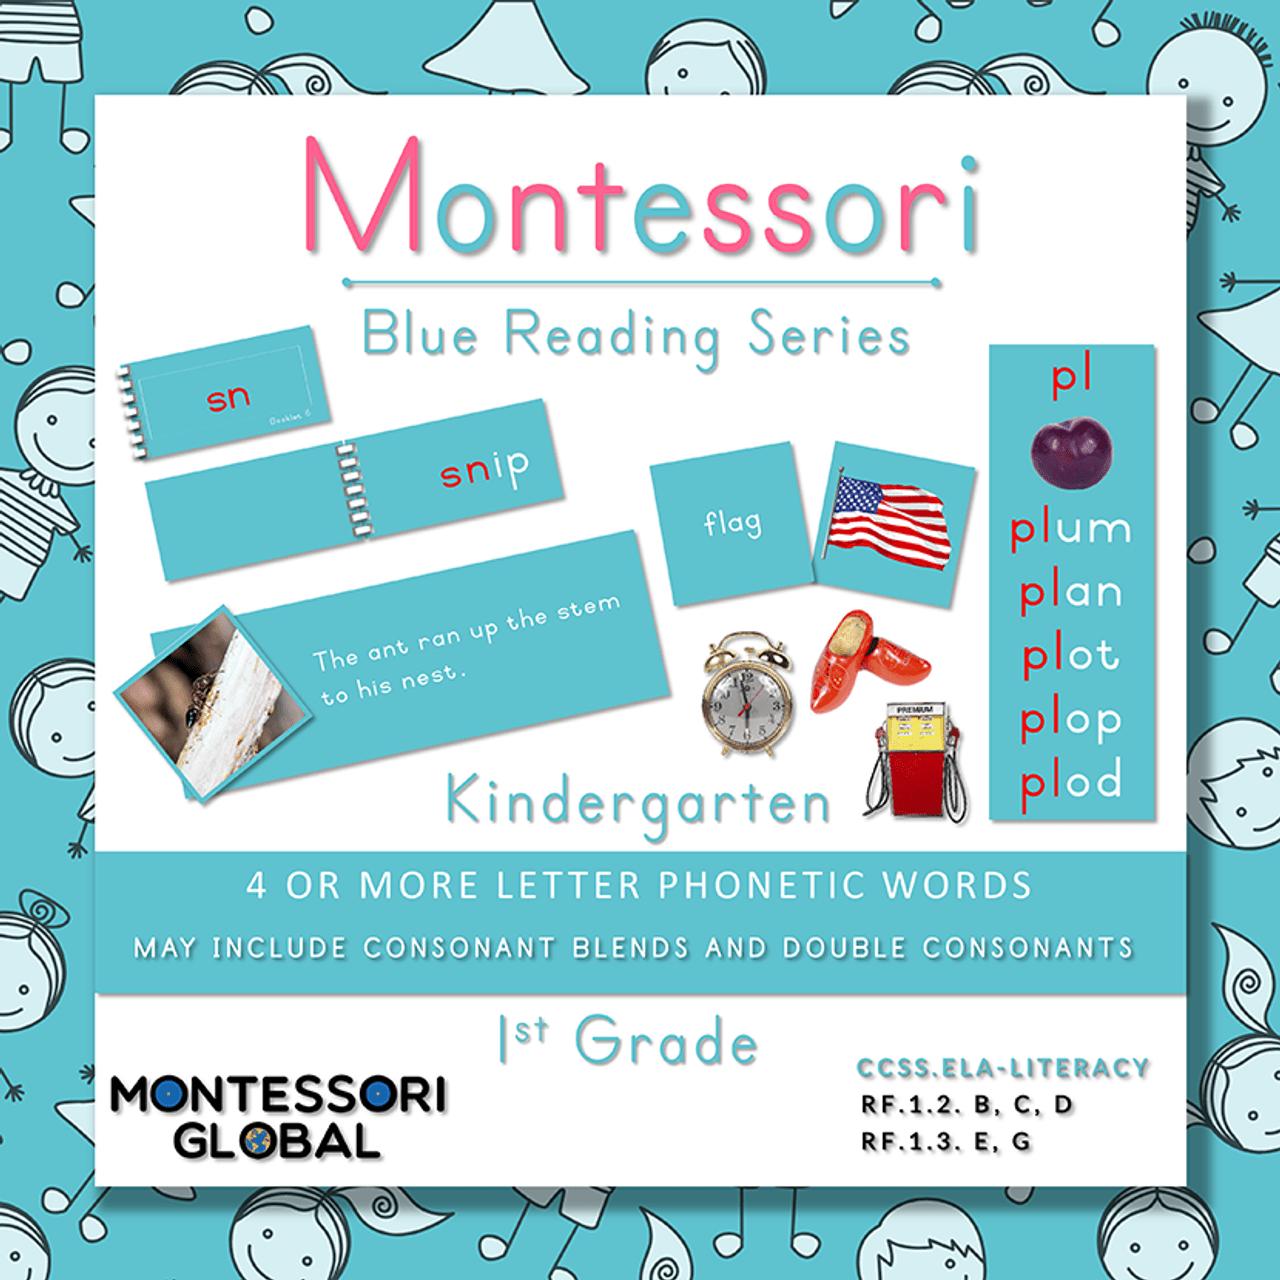 hight resolution of Montessori Blue Reading Series - Consonant Blends